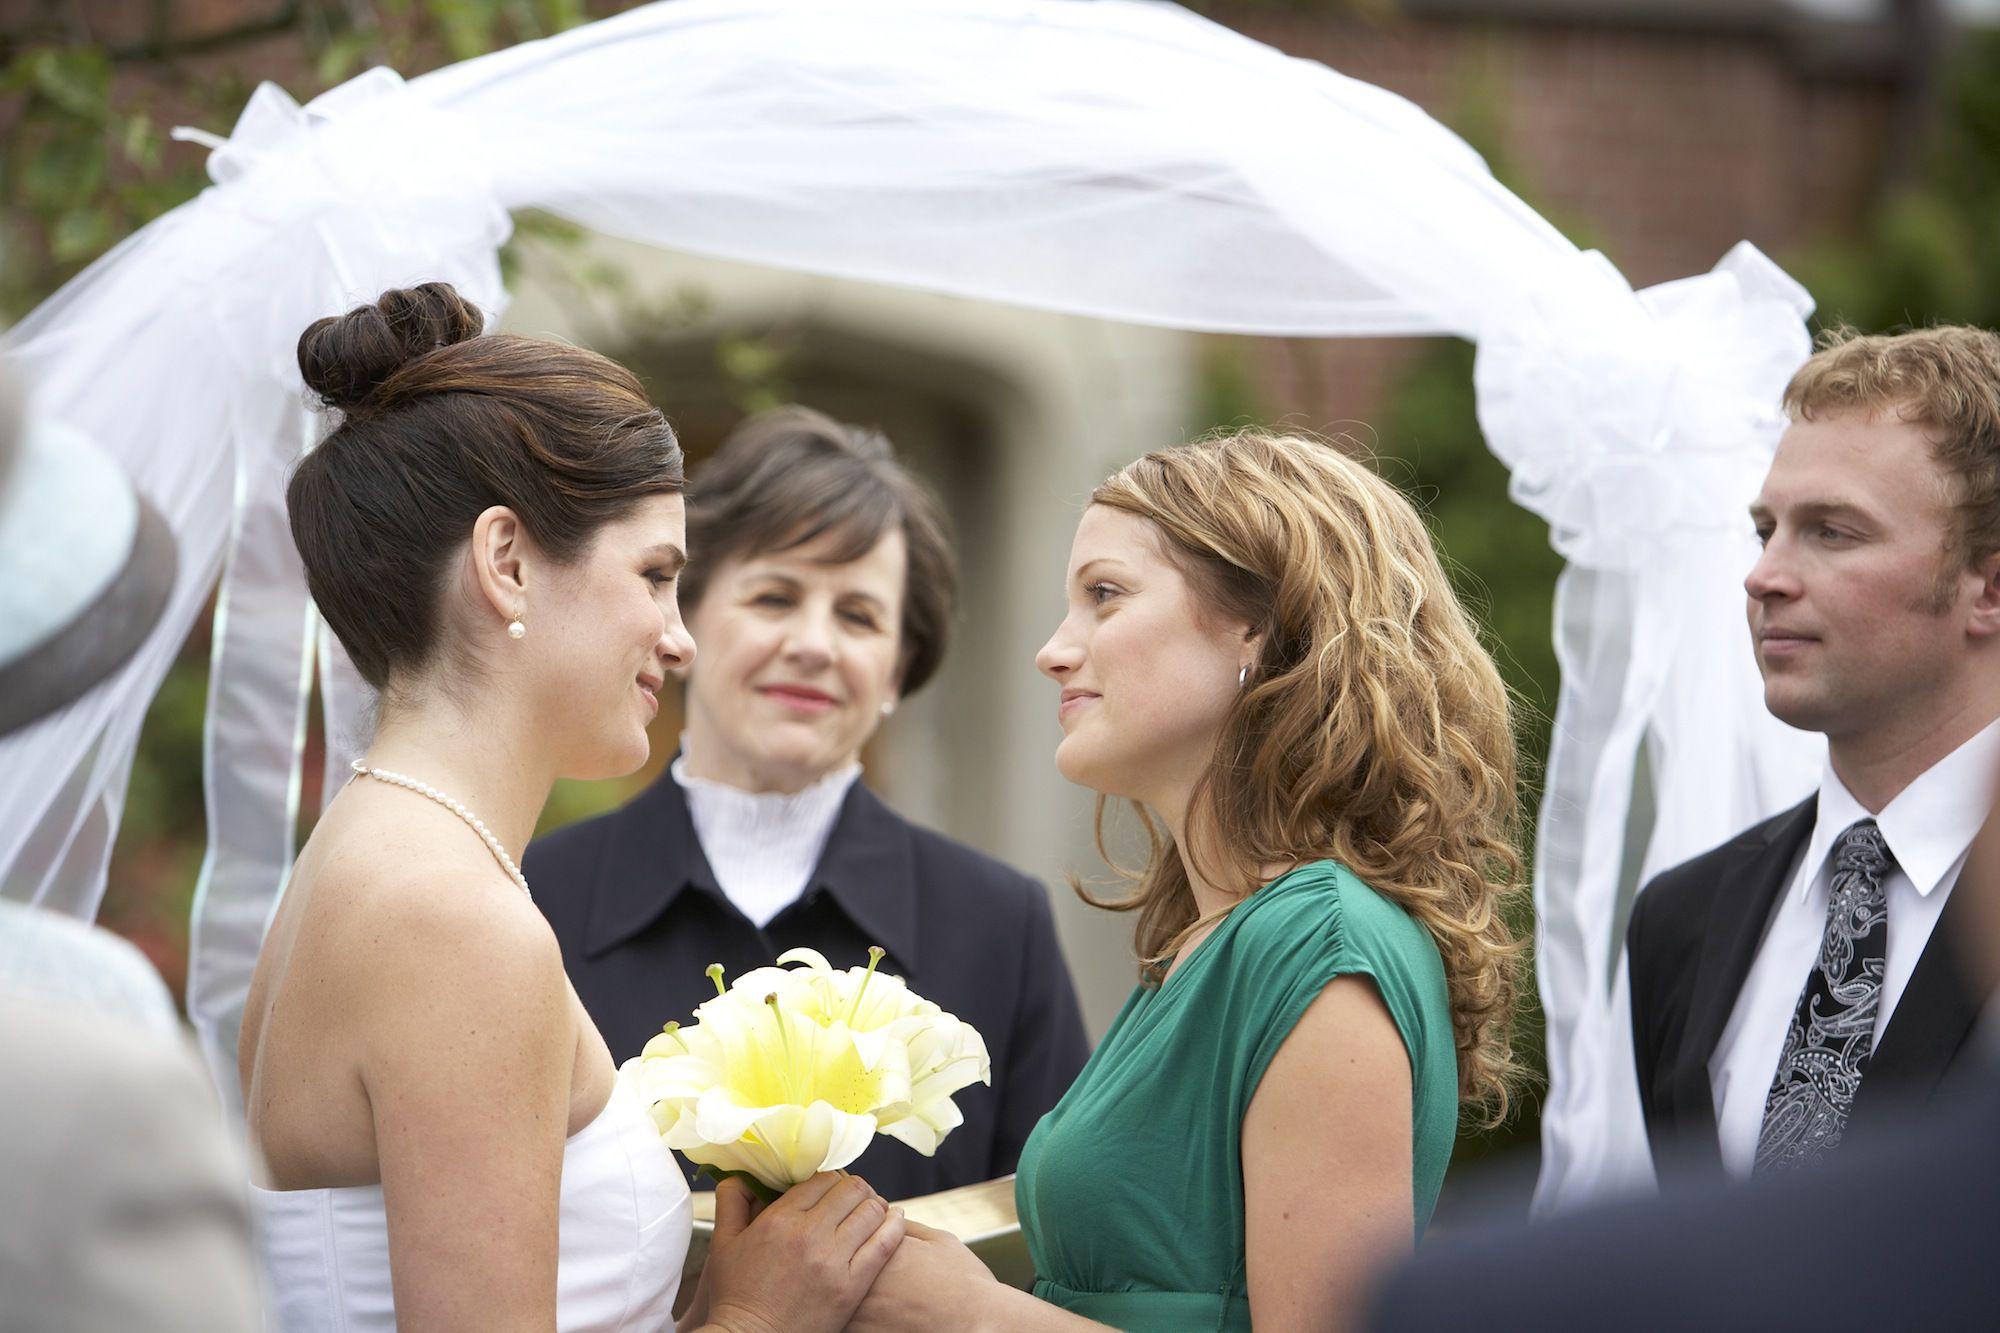 The Top Lesbian Wedding Songs